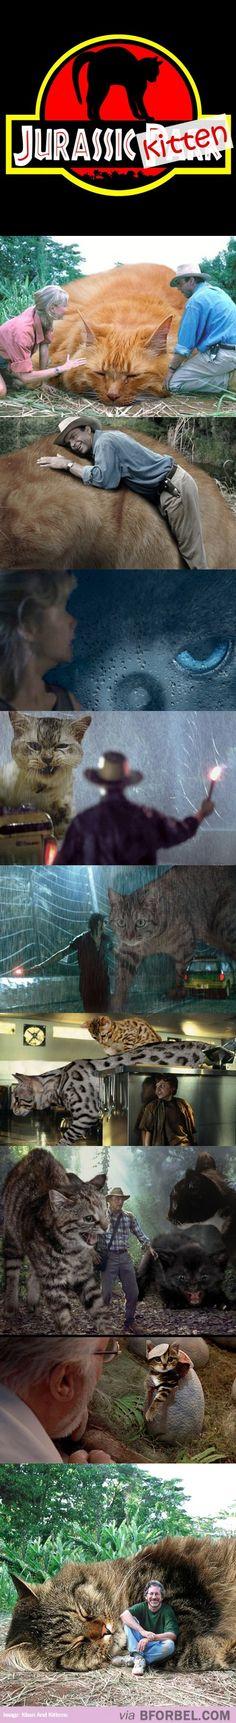 Jurassic Kitten…